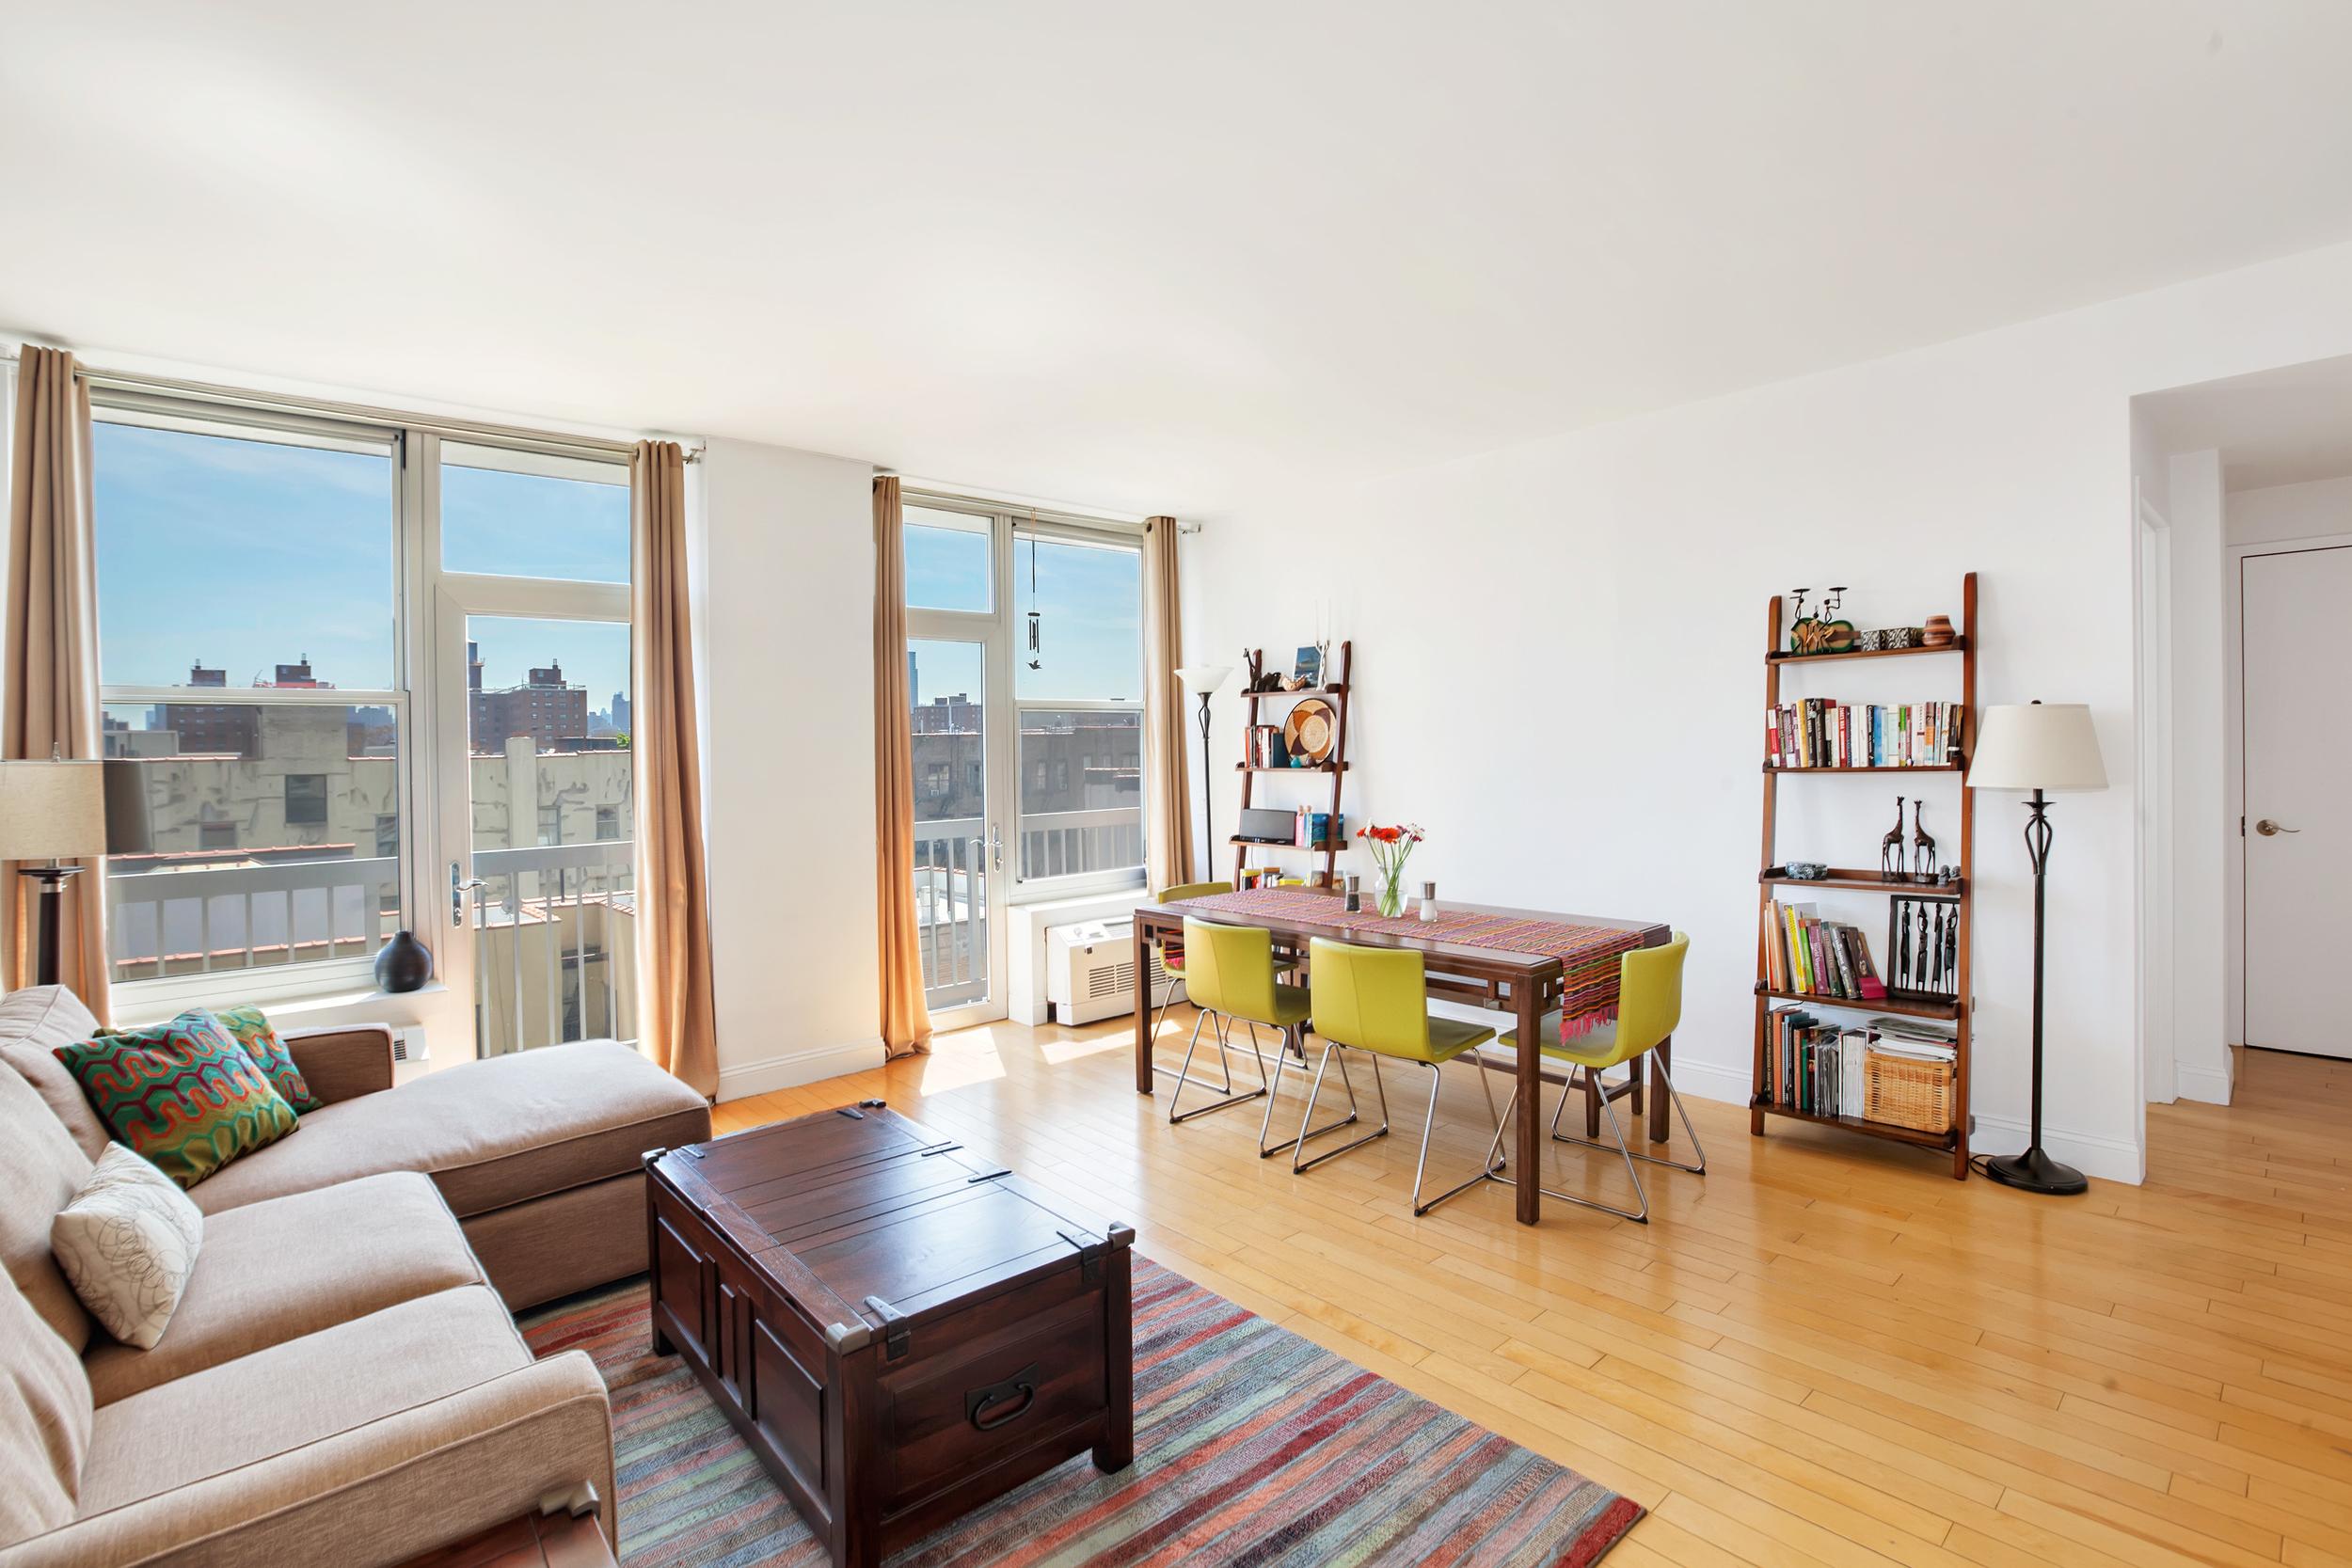 249 East 118th Street #7B - $875,000